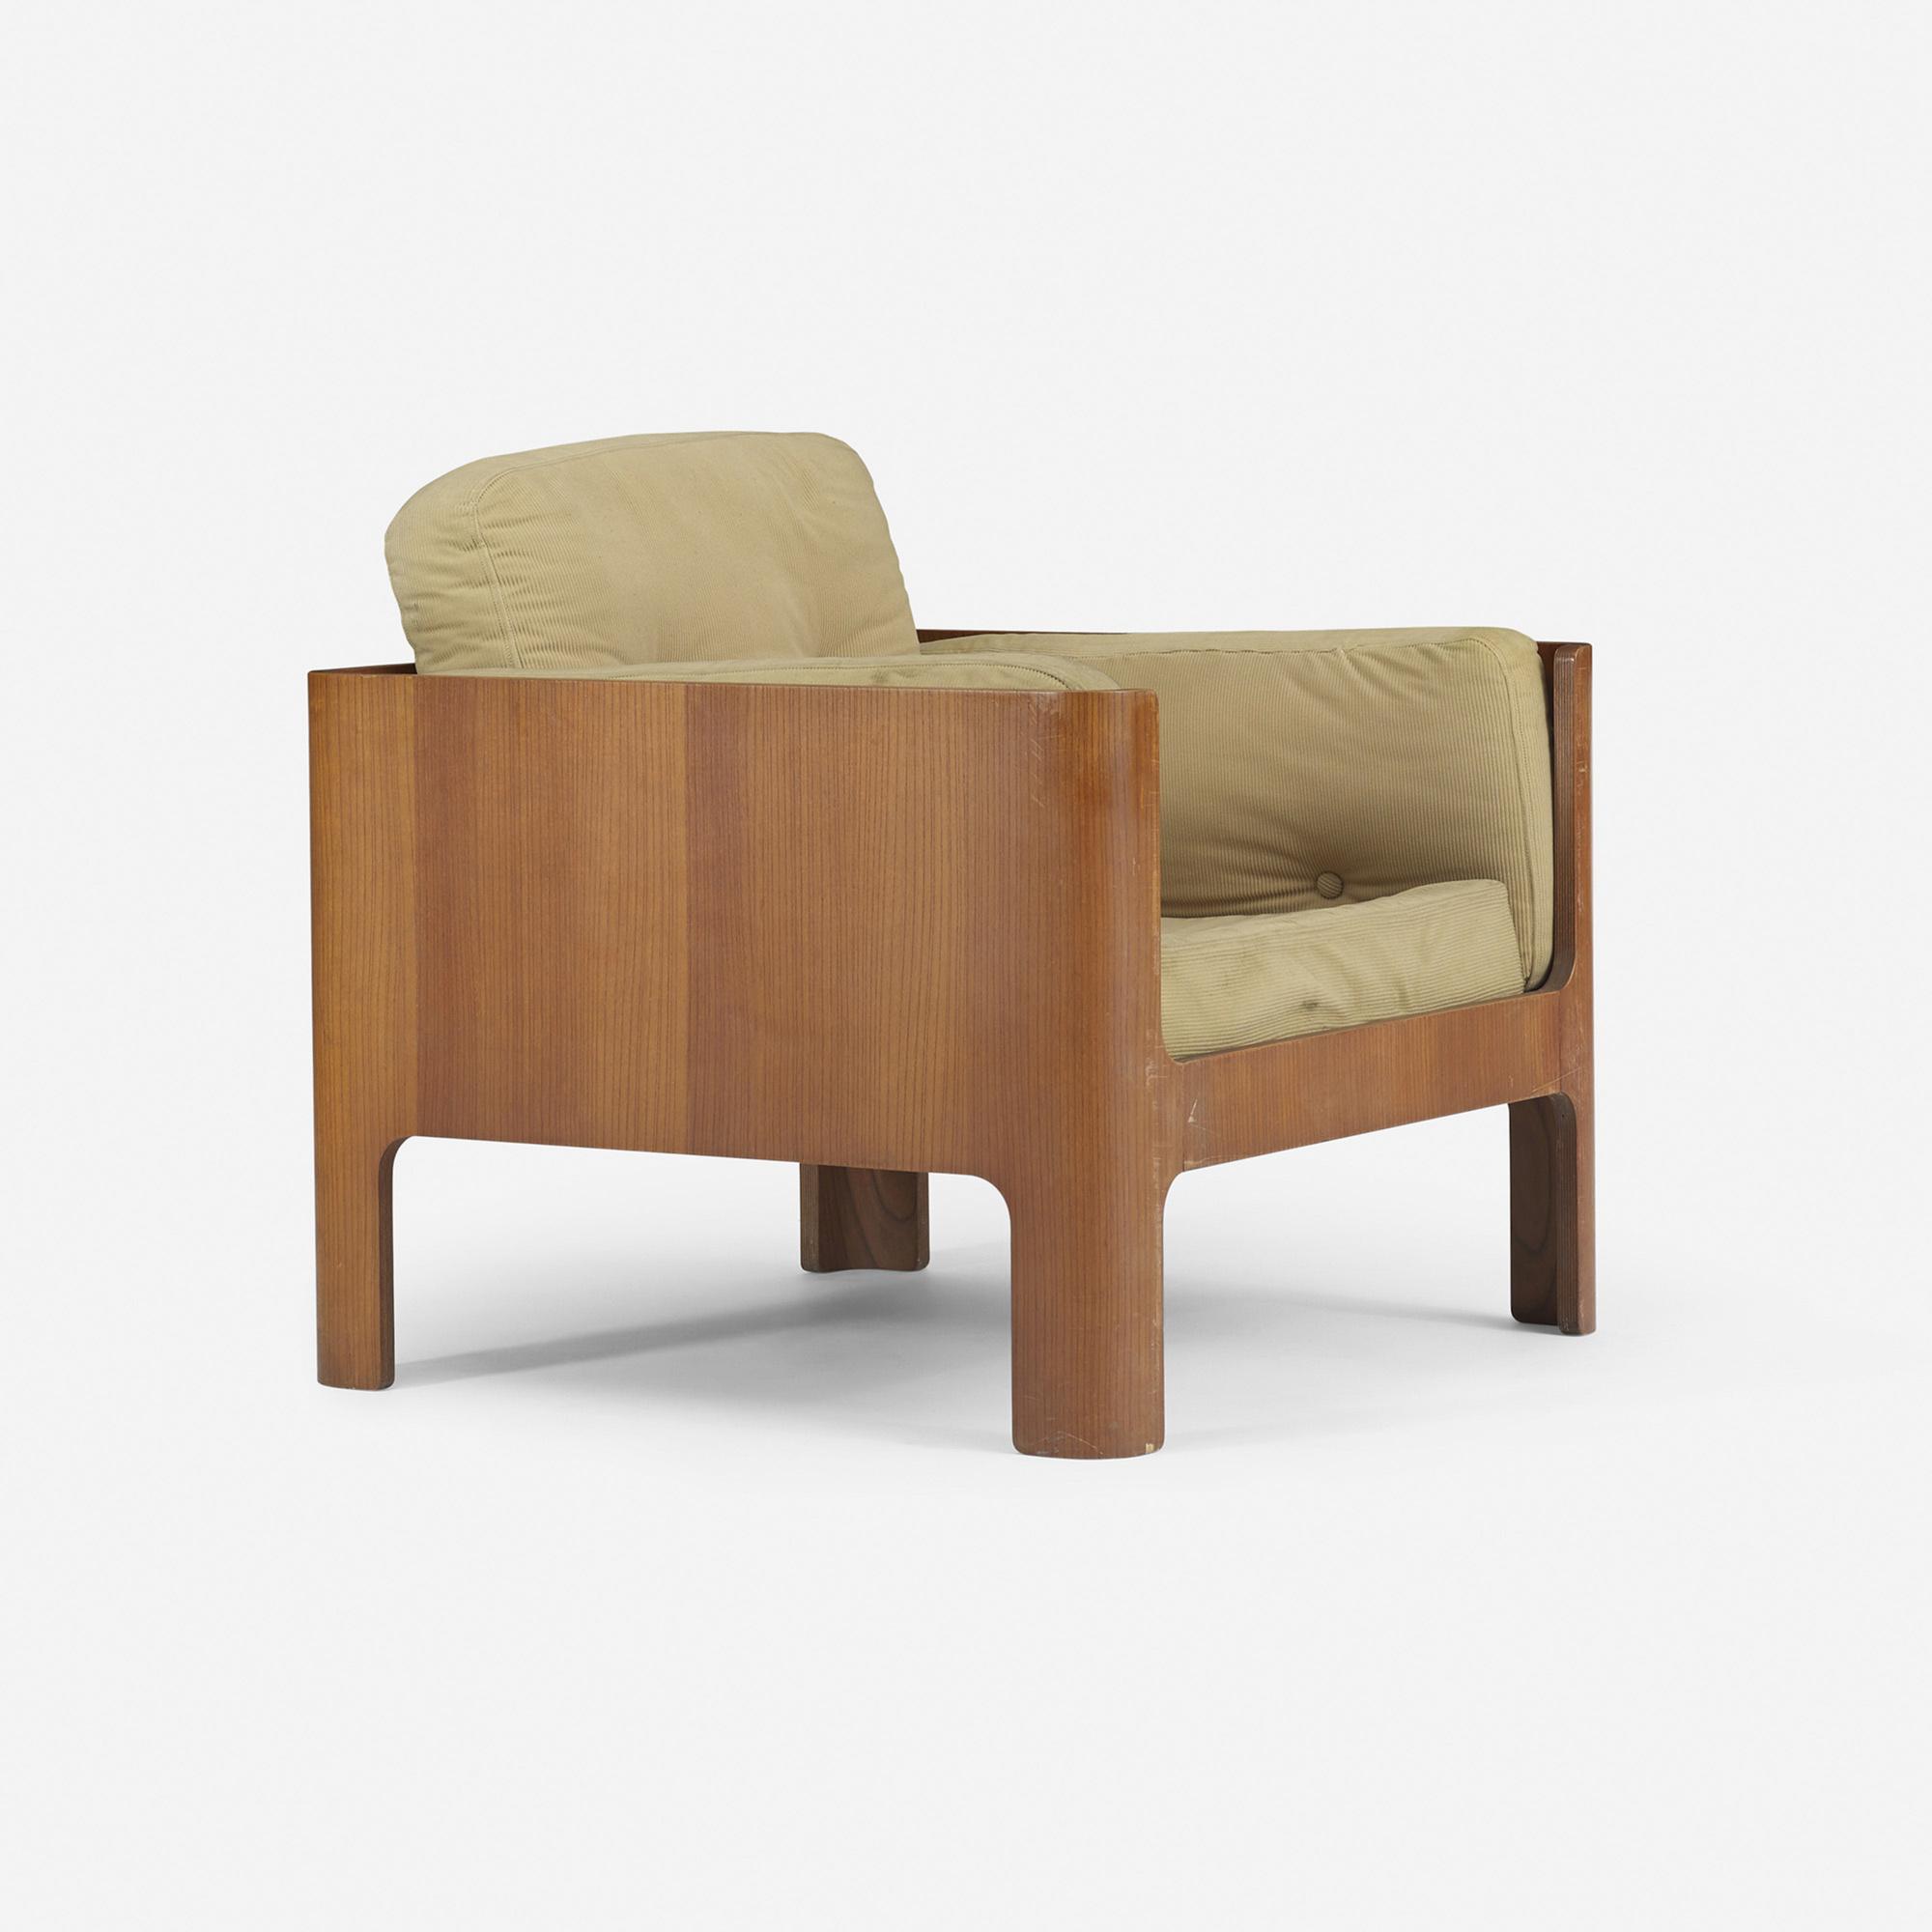 385: Isamu Kenmochi / lounge chair (2 of 3)